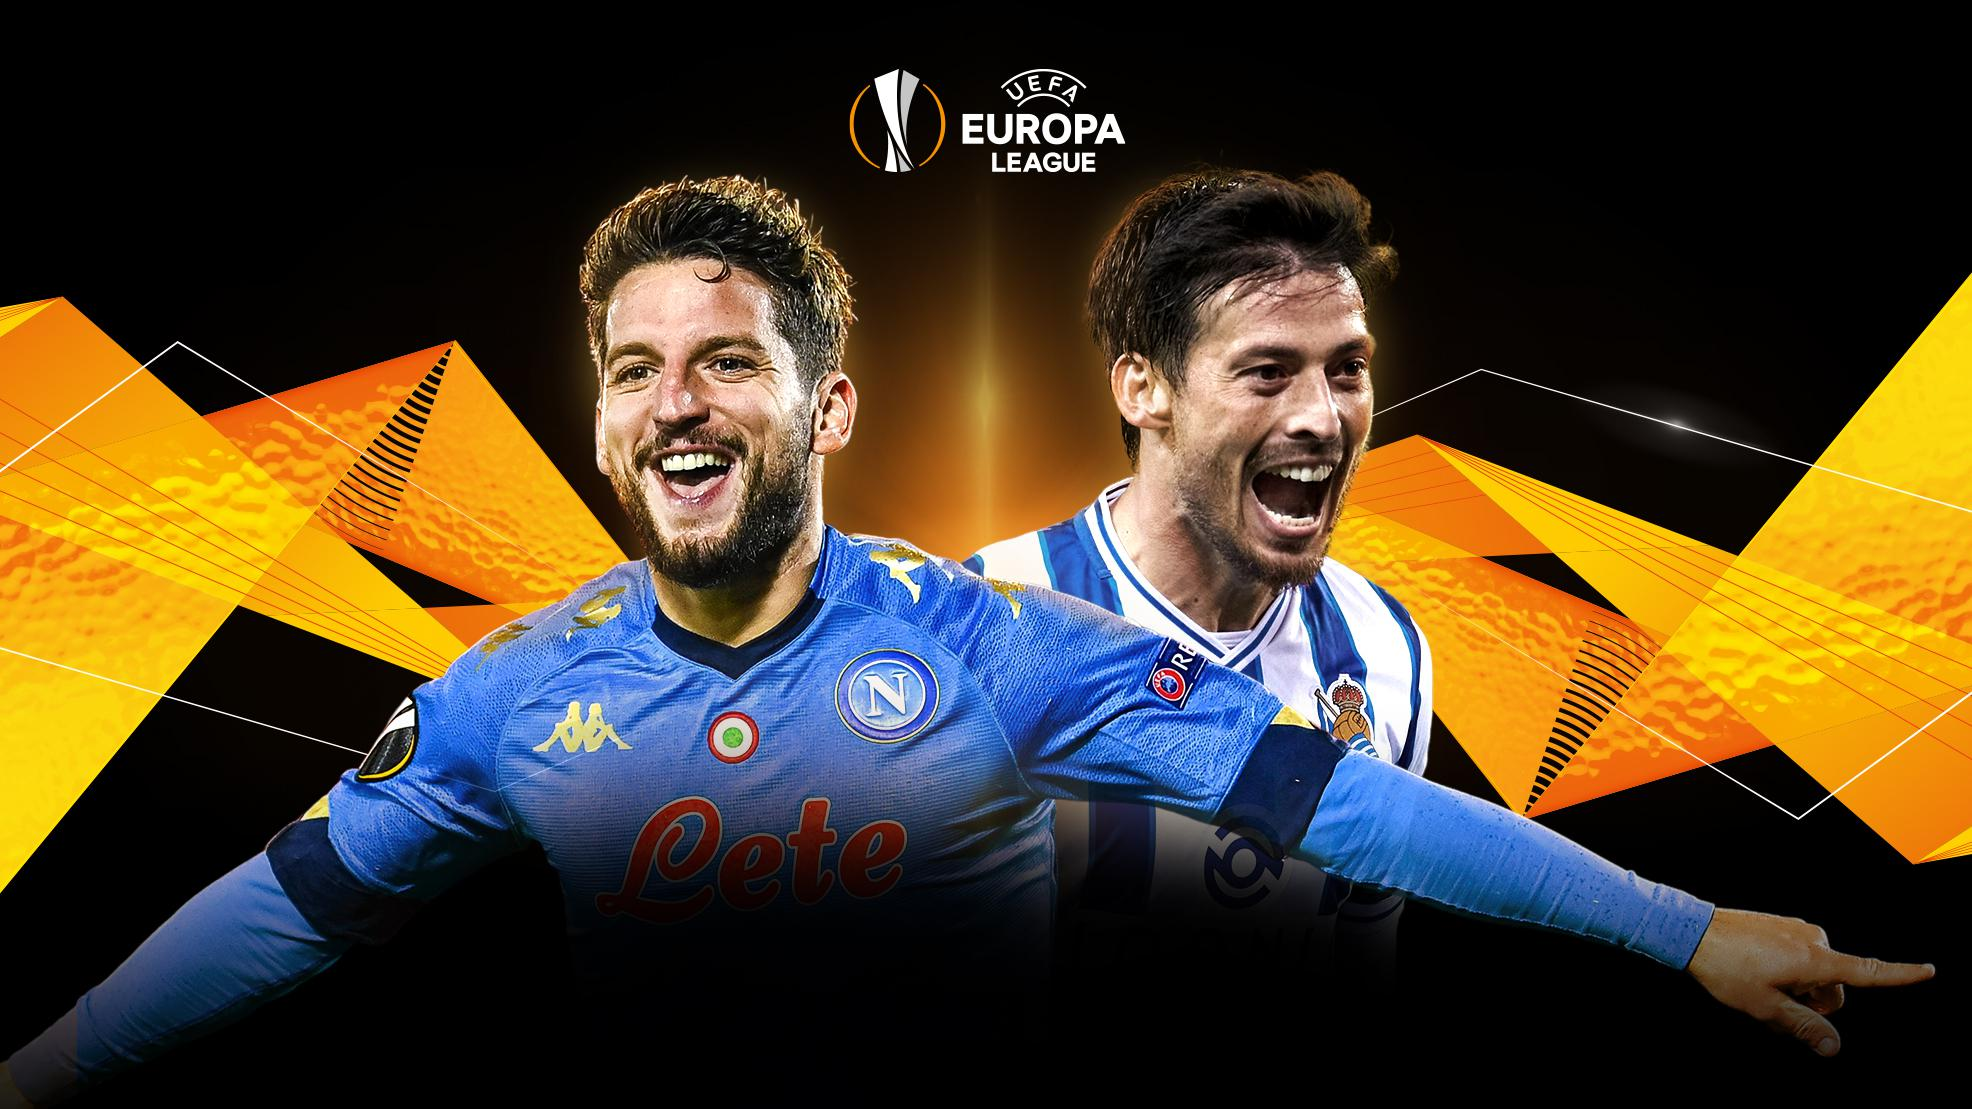 Destaques da UEFA Europa League para a última jornada